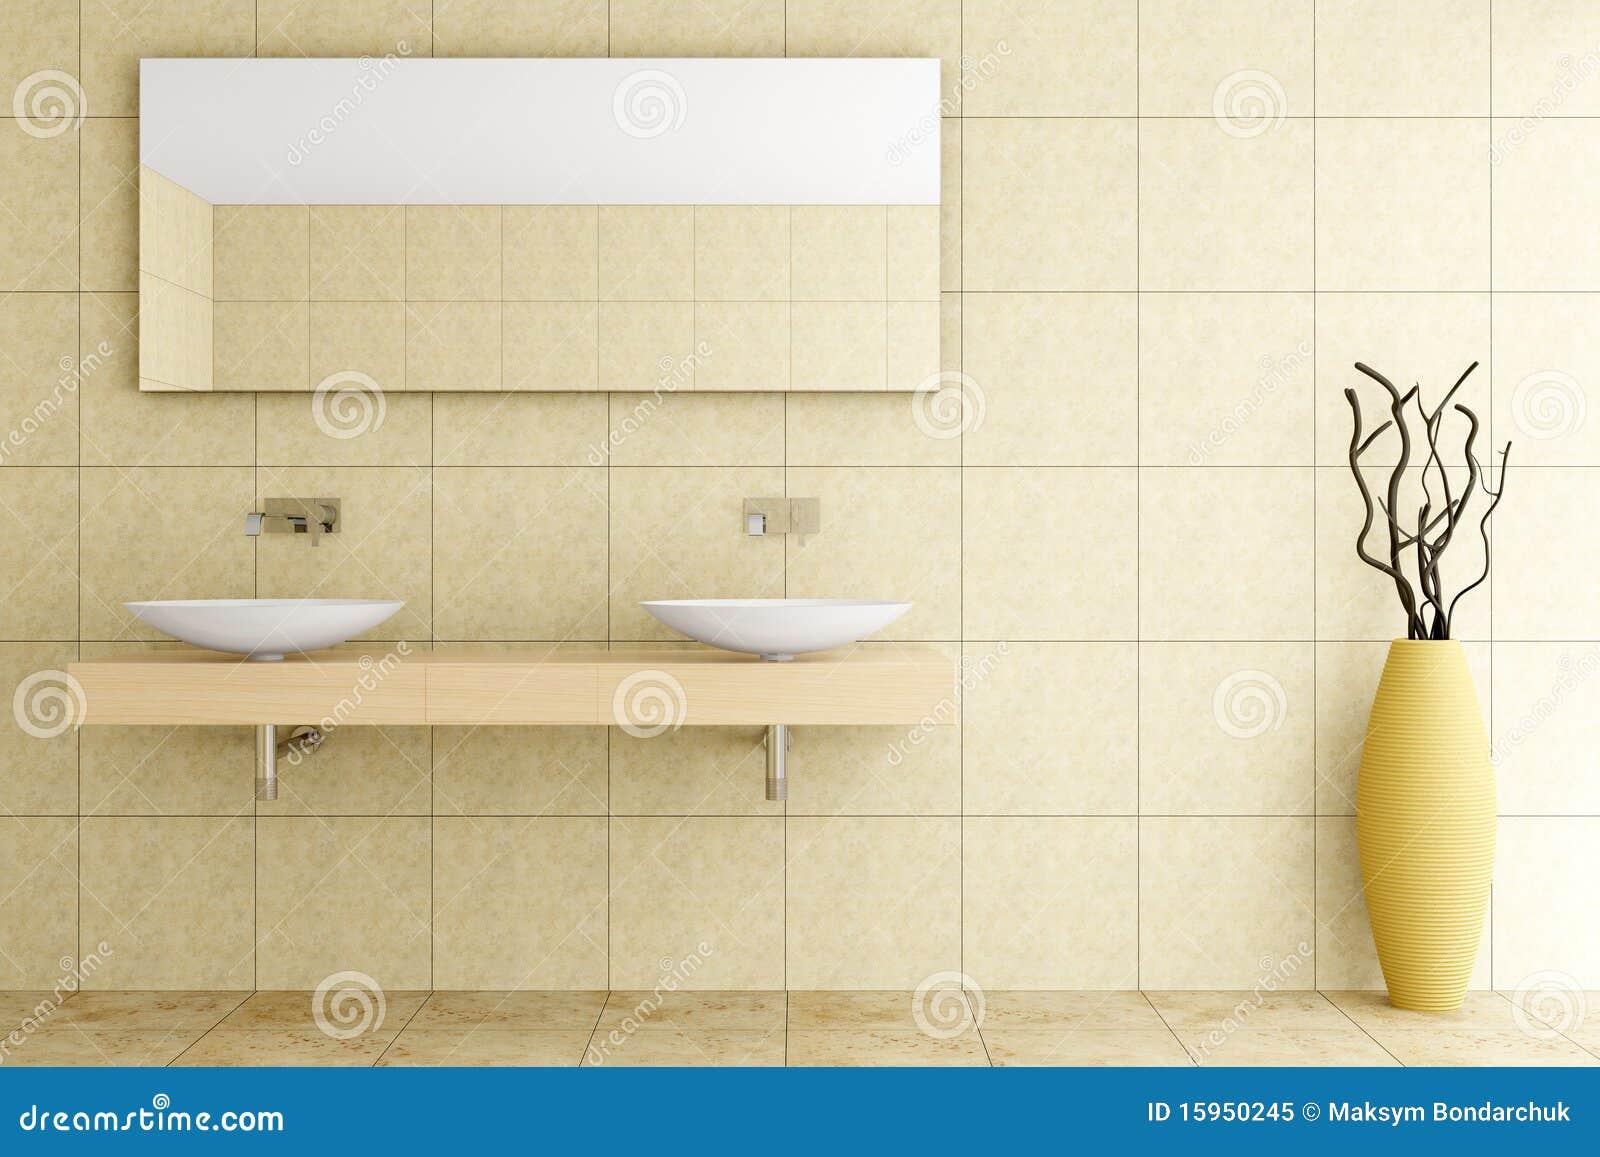 Moderne Badkamers Met Beige Tegels Op Muur Royalty-vrije Stock Foto ...